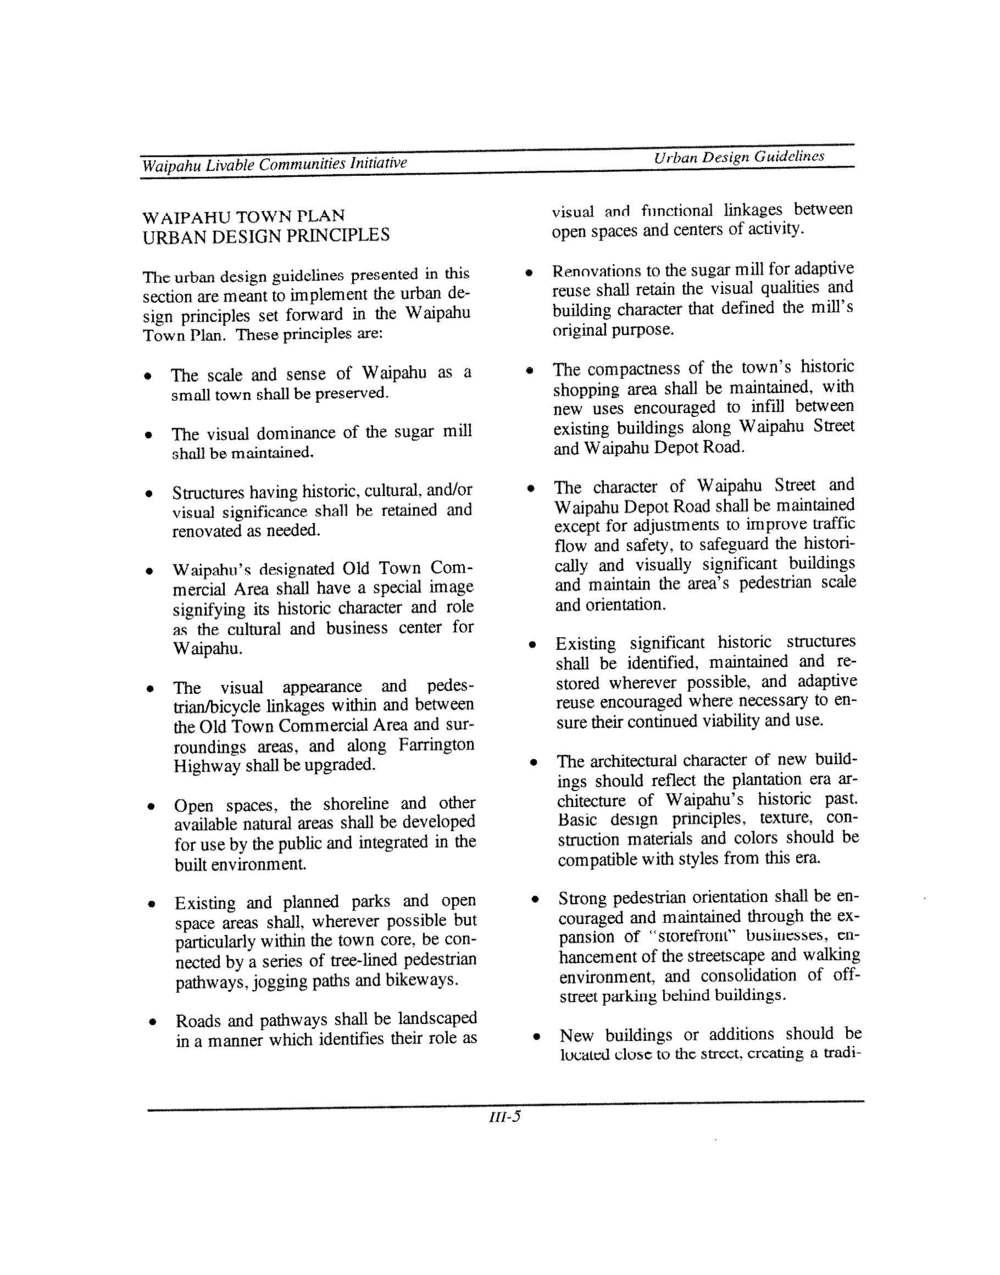 160531_WaipahuLivableCommunities(1998)_Page_095.jpg